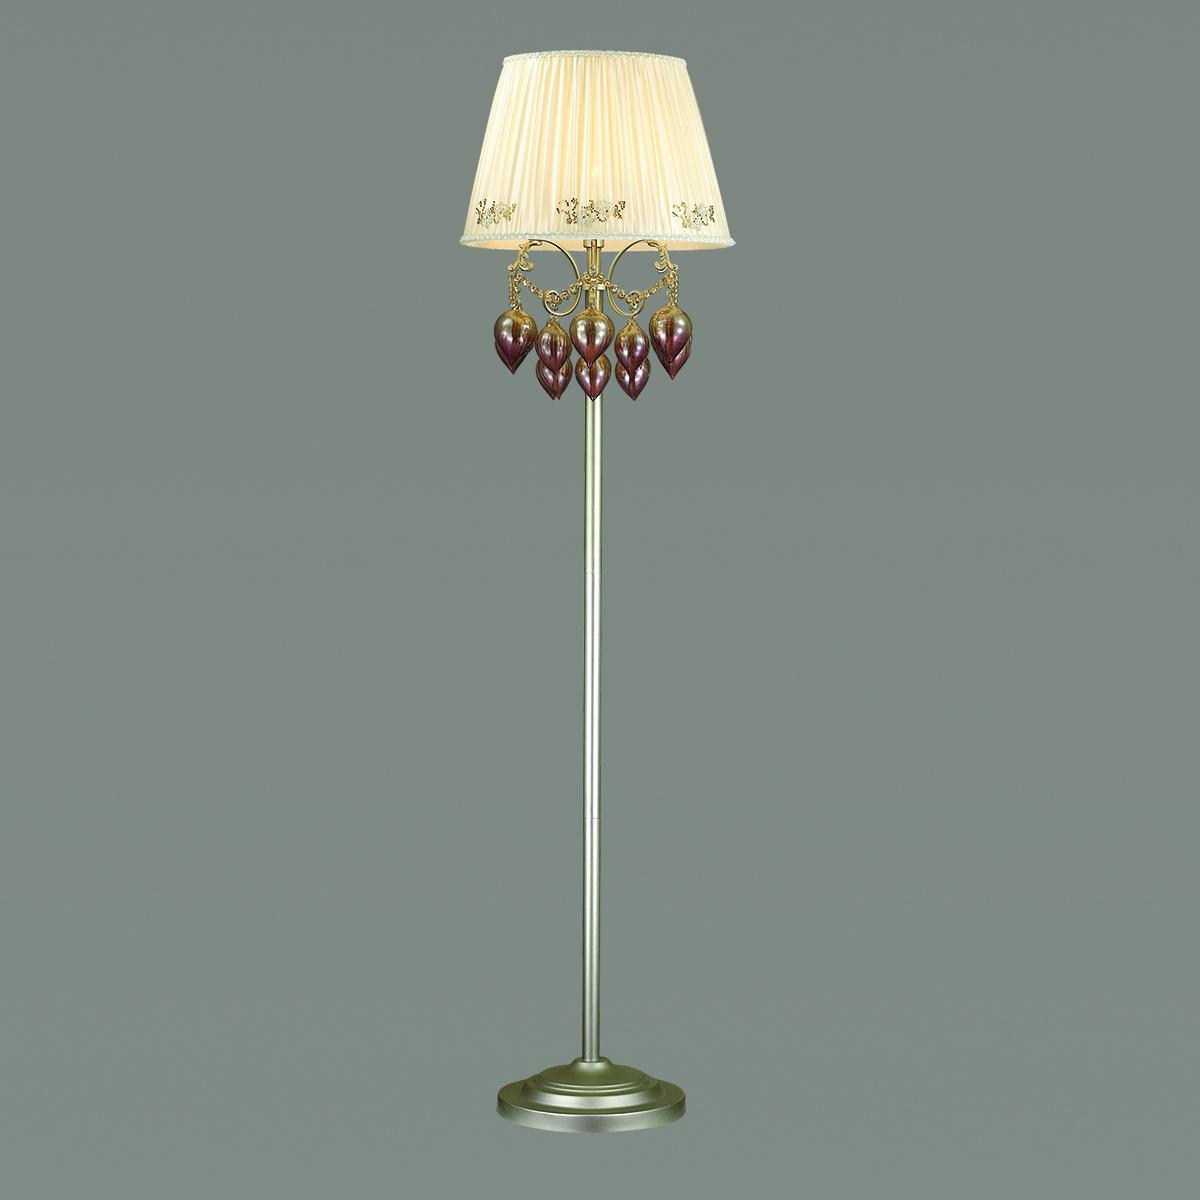 Торшер Odeon Light Adriana 3922/1F, 1xE14x40W, серебро, бежевый, коньячный, розовый, металл, текстиль, стекло - фото 1